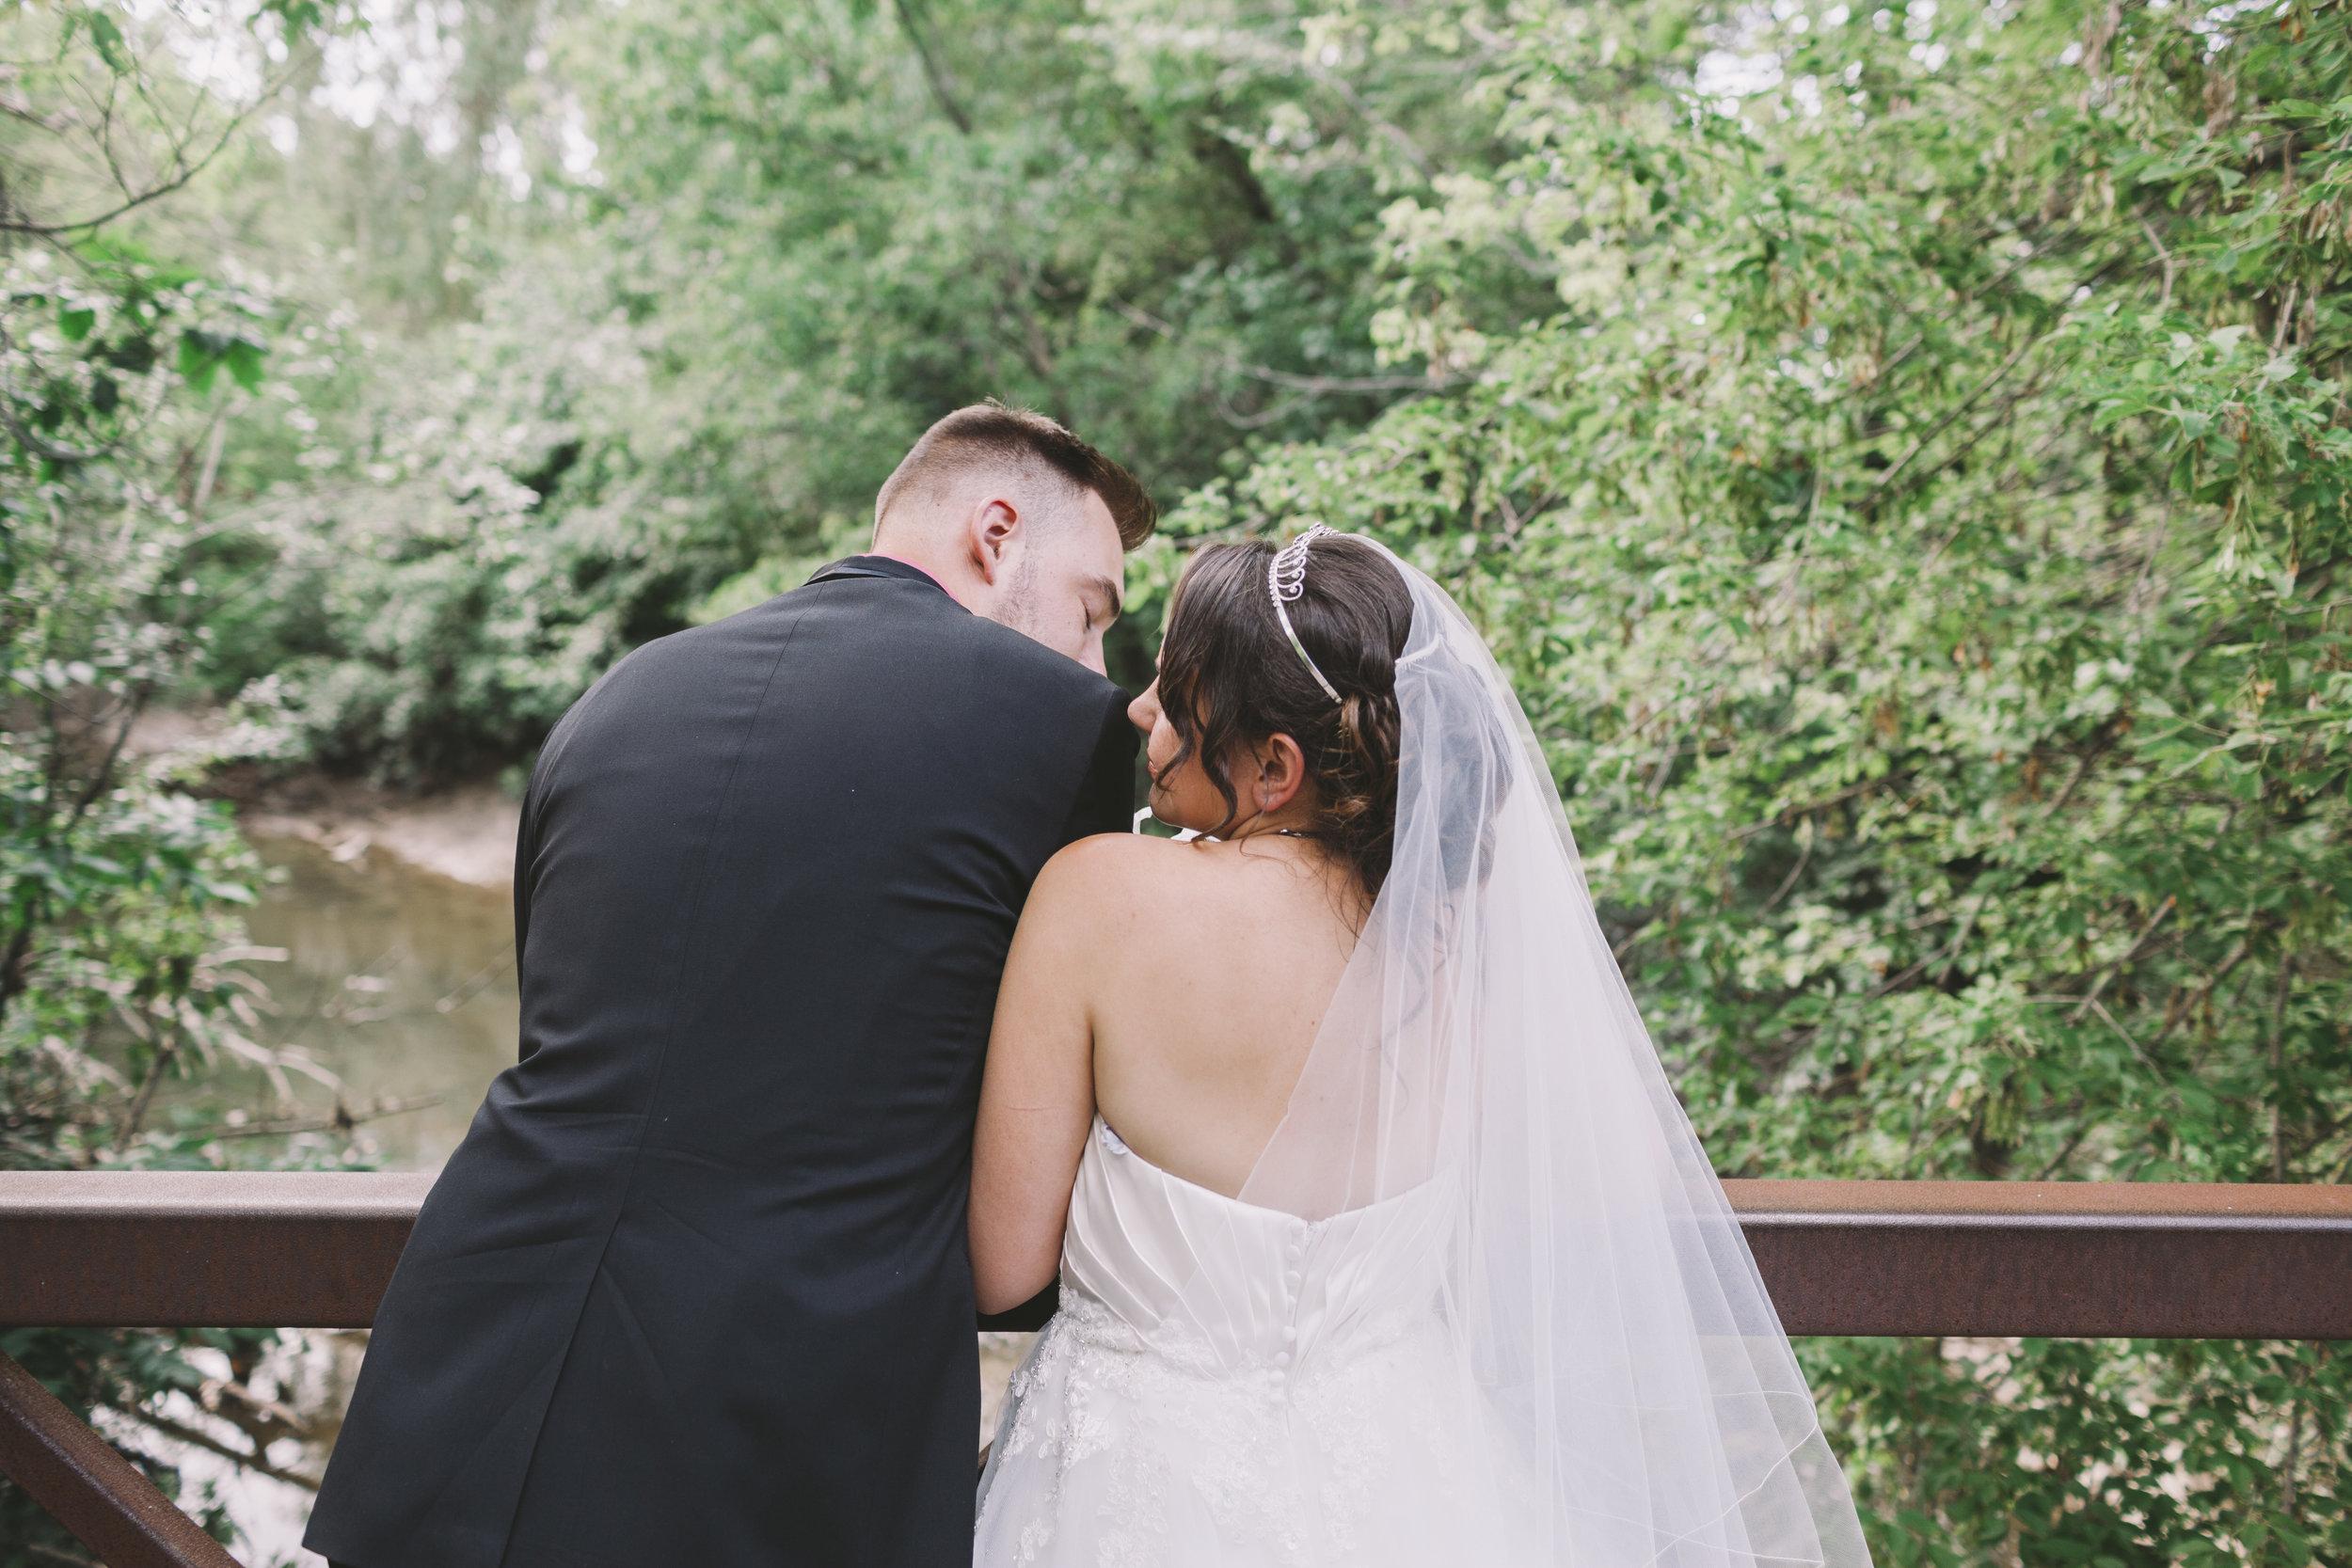 Wedding Couple at Glen Shields Park